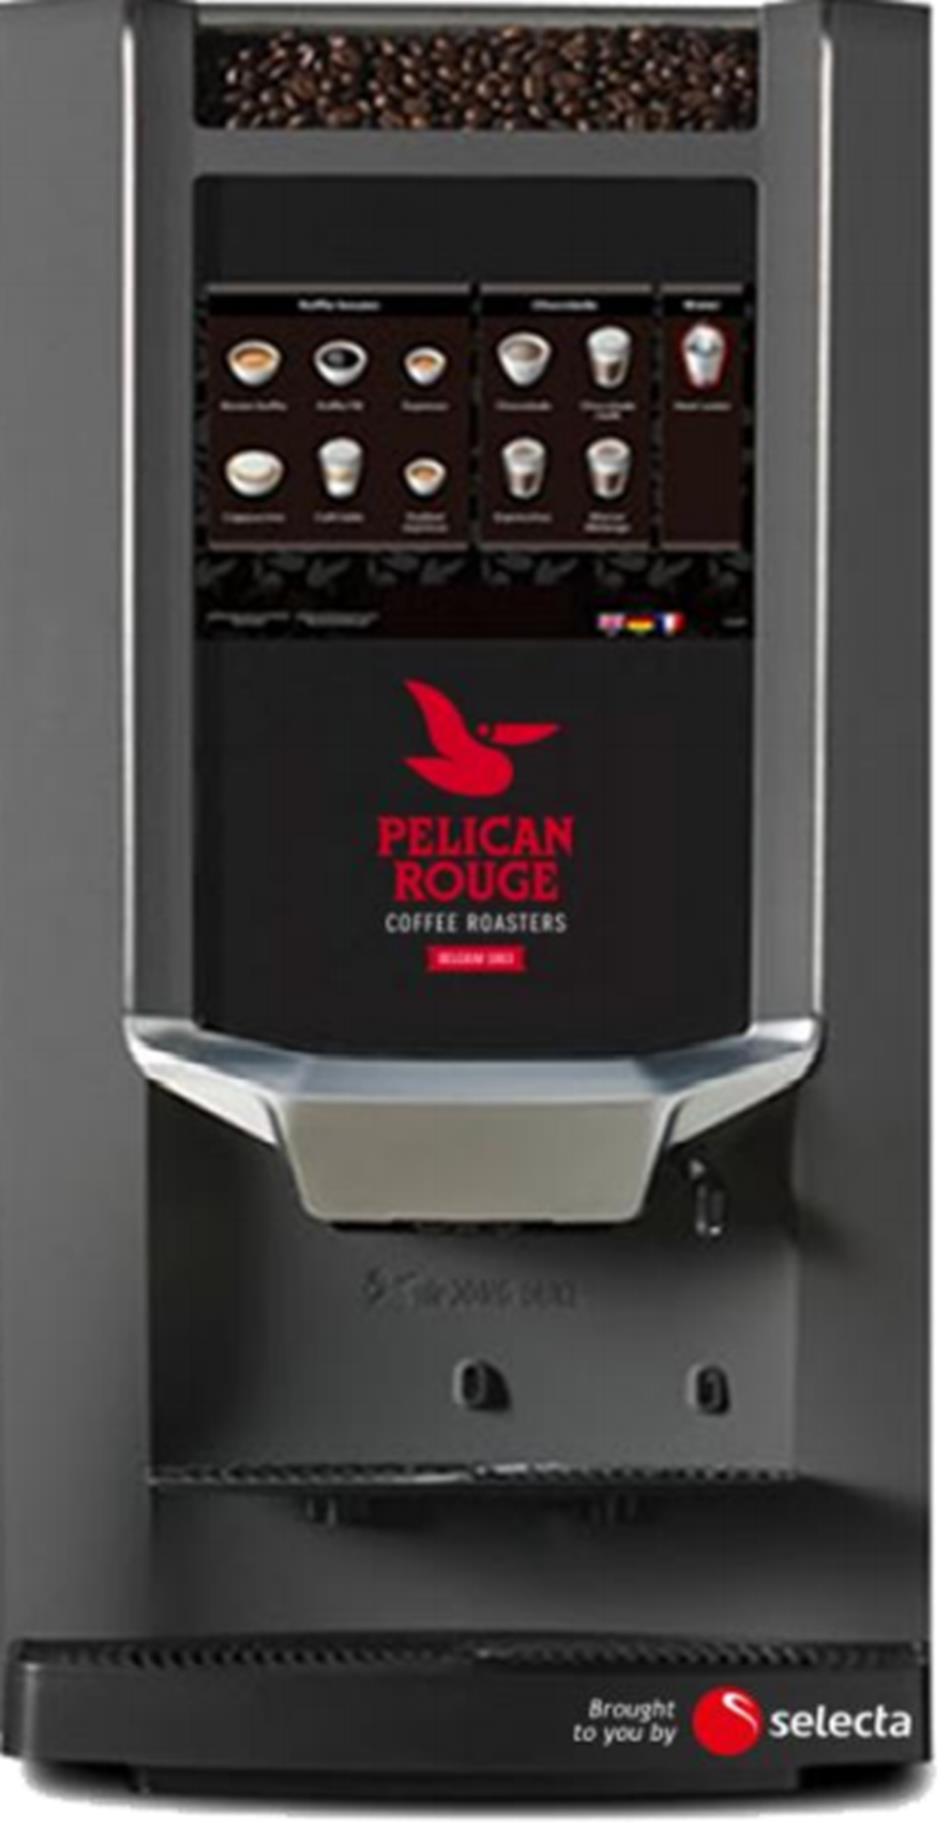 210828 Nieuwe koffiemachine.png